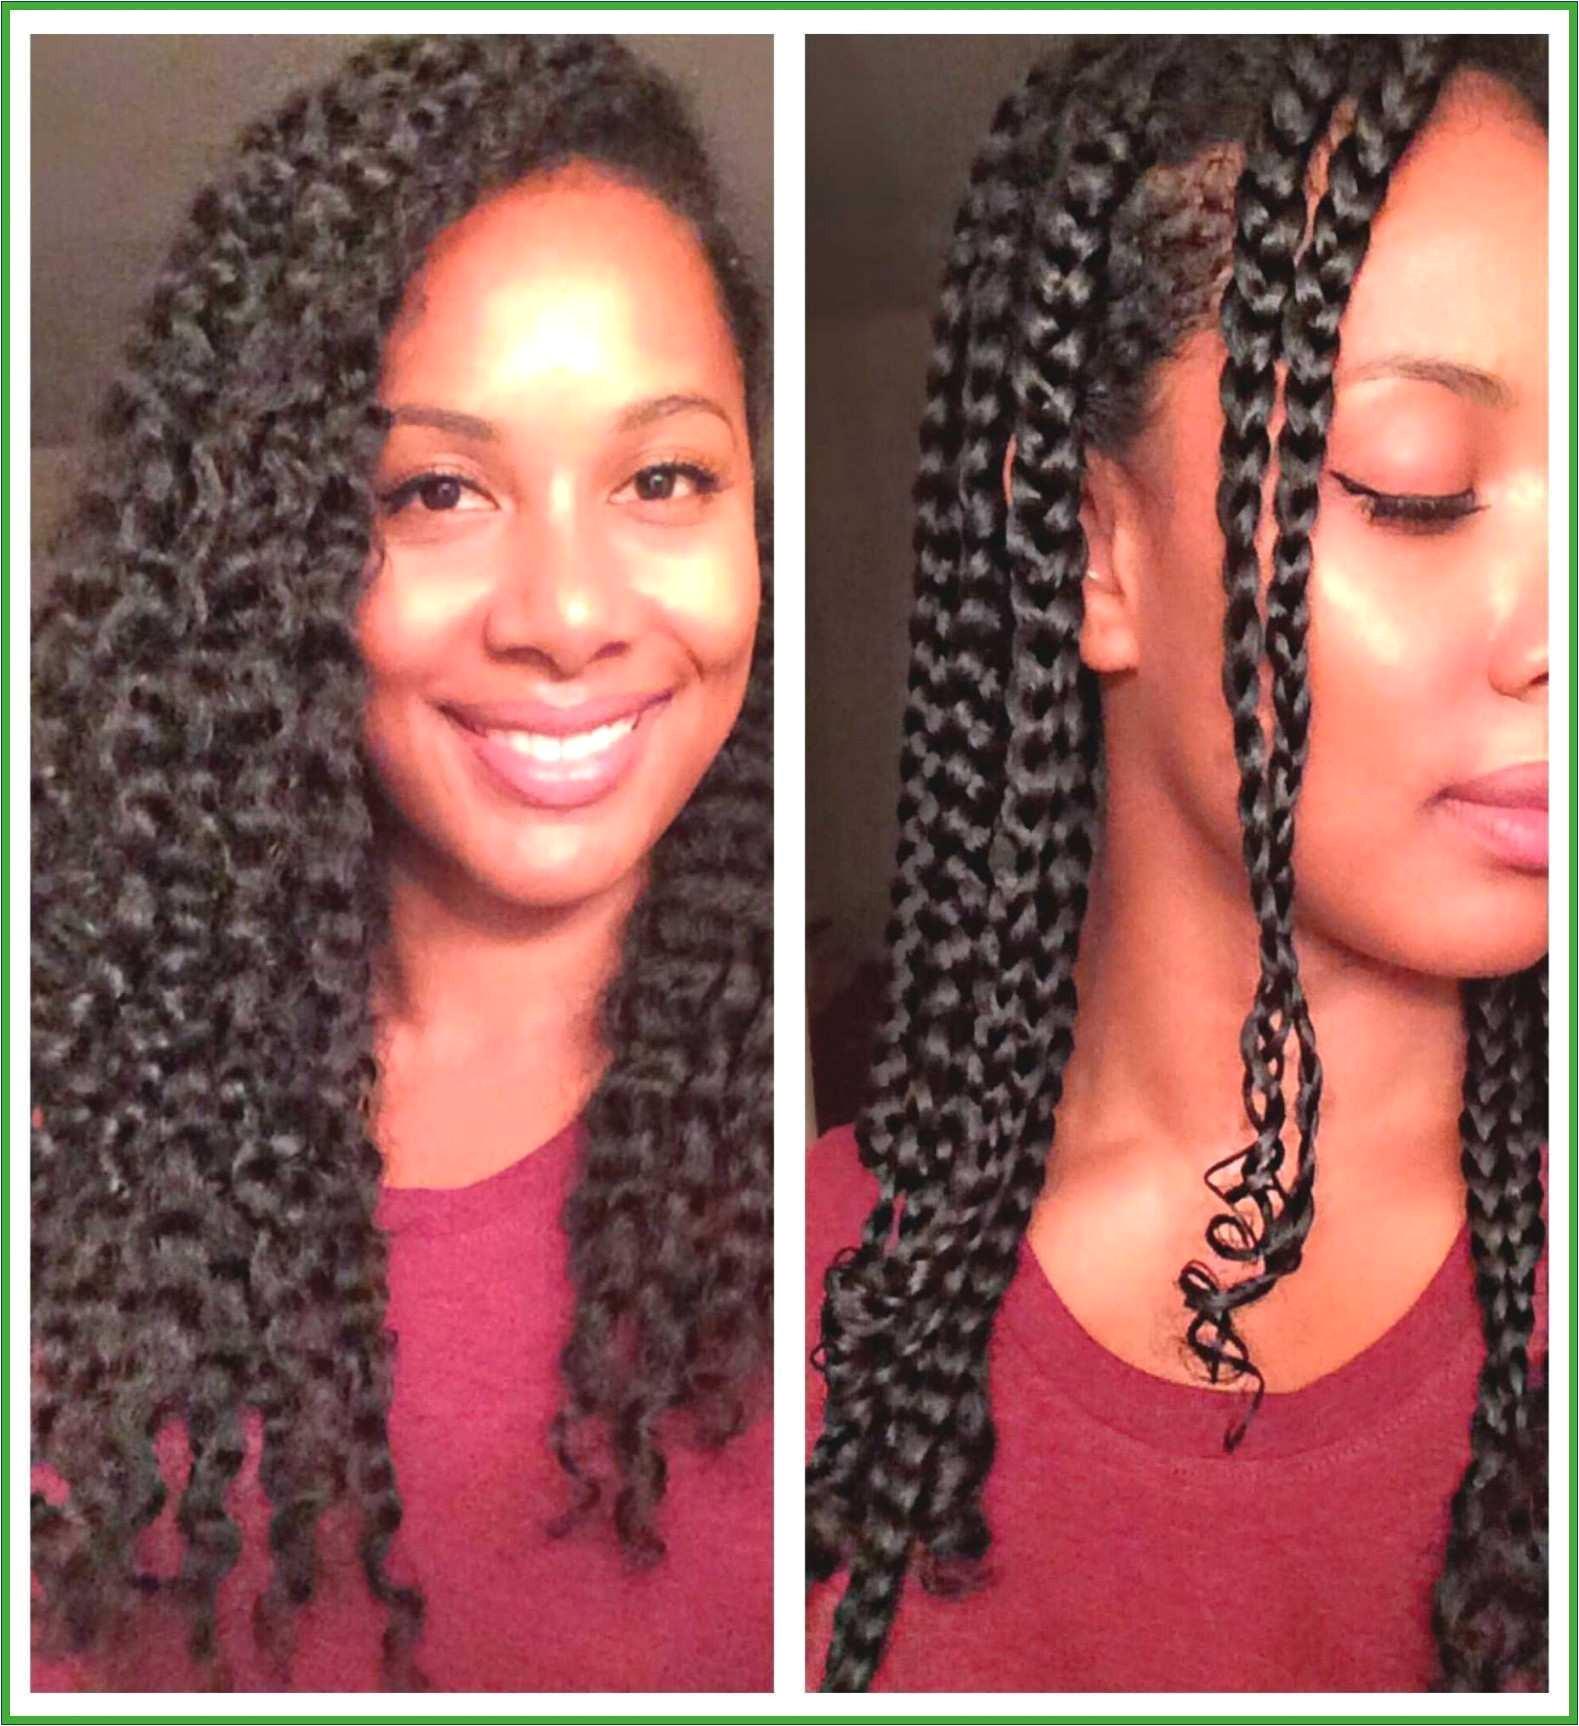 Girl with Black Hair Tumblr Simple I54m Braided Hairstyles Black Hair 2014 Girl with Black